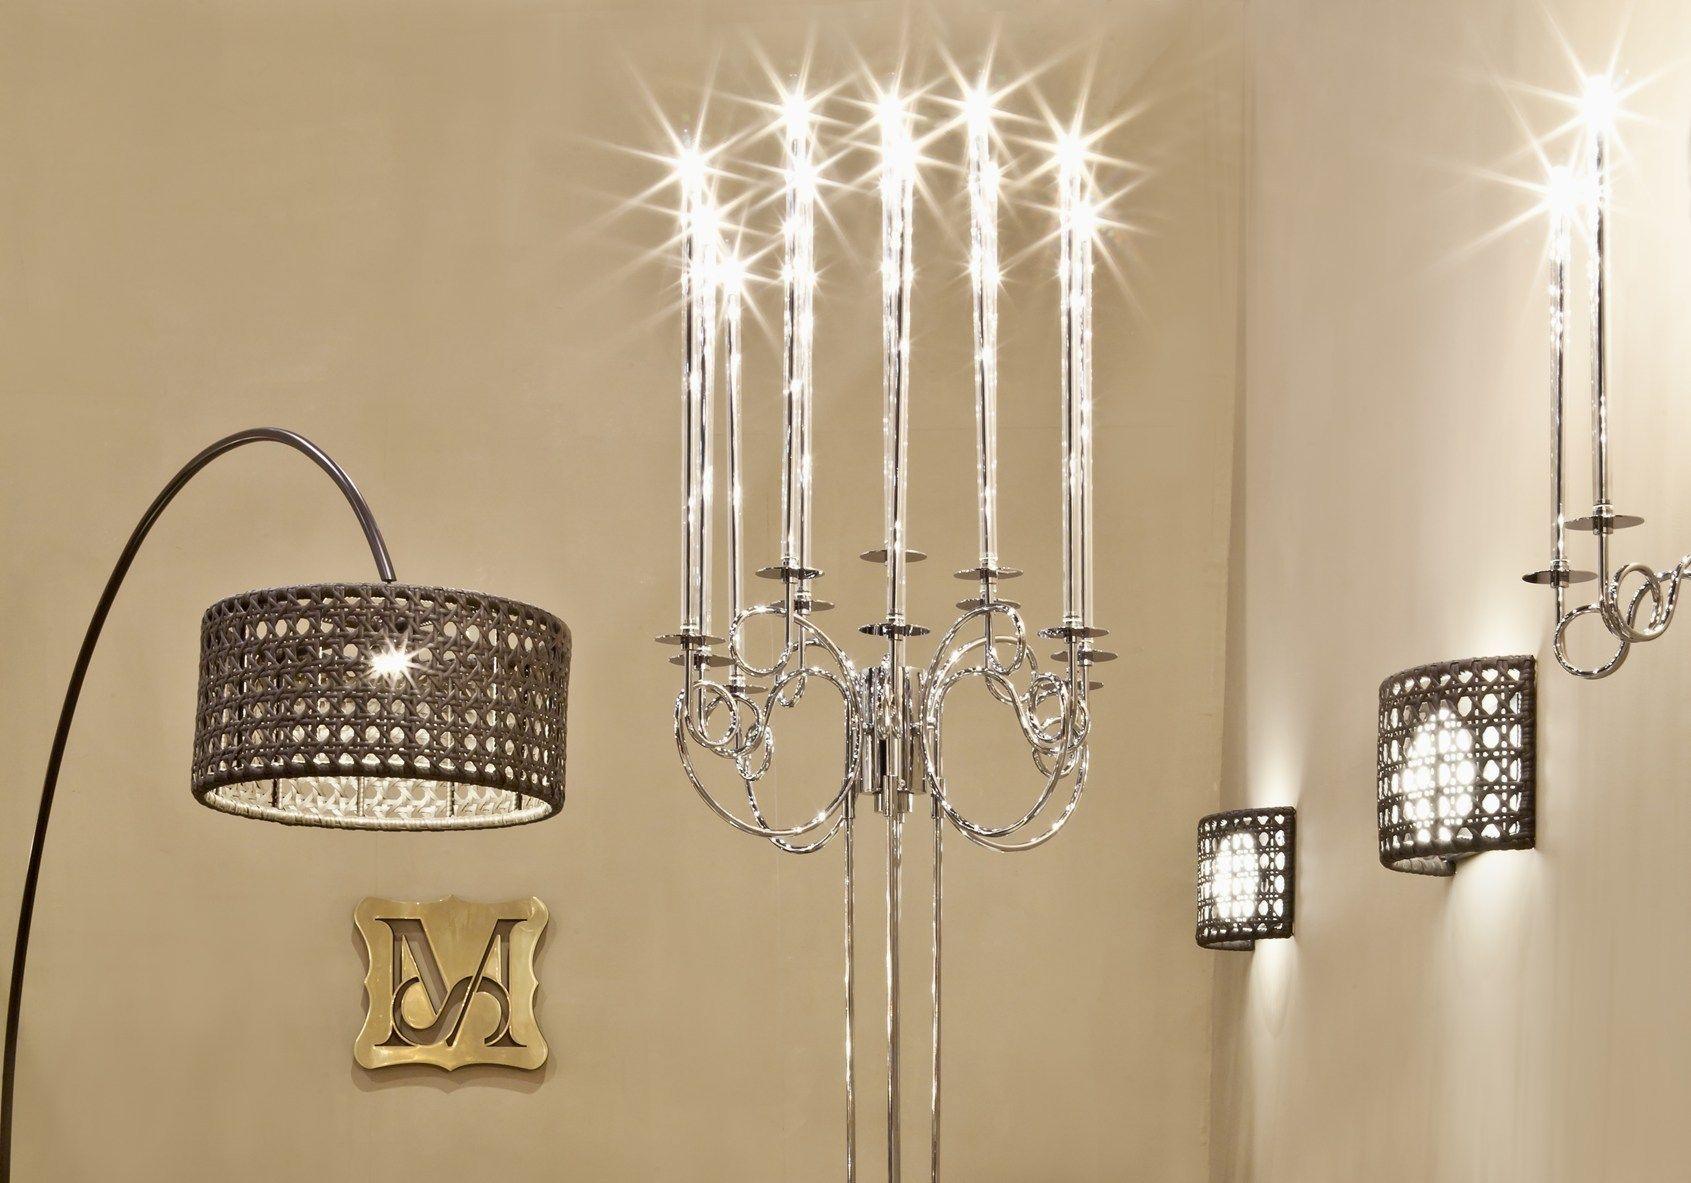 decor design gallery decorative lights home led ideas